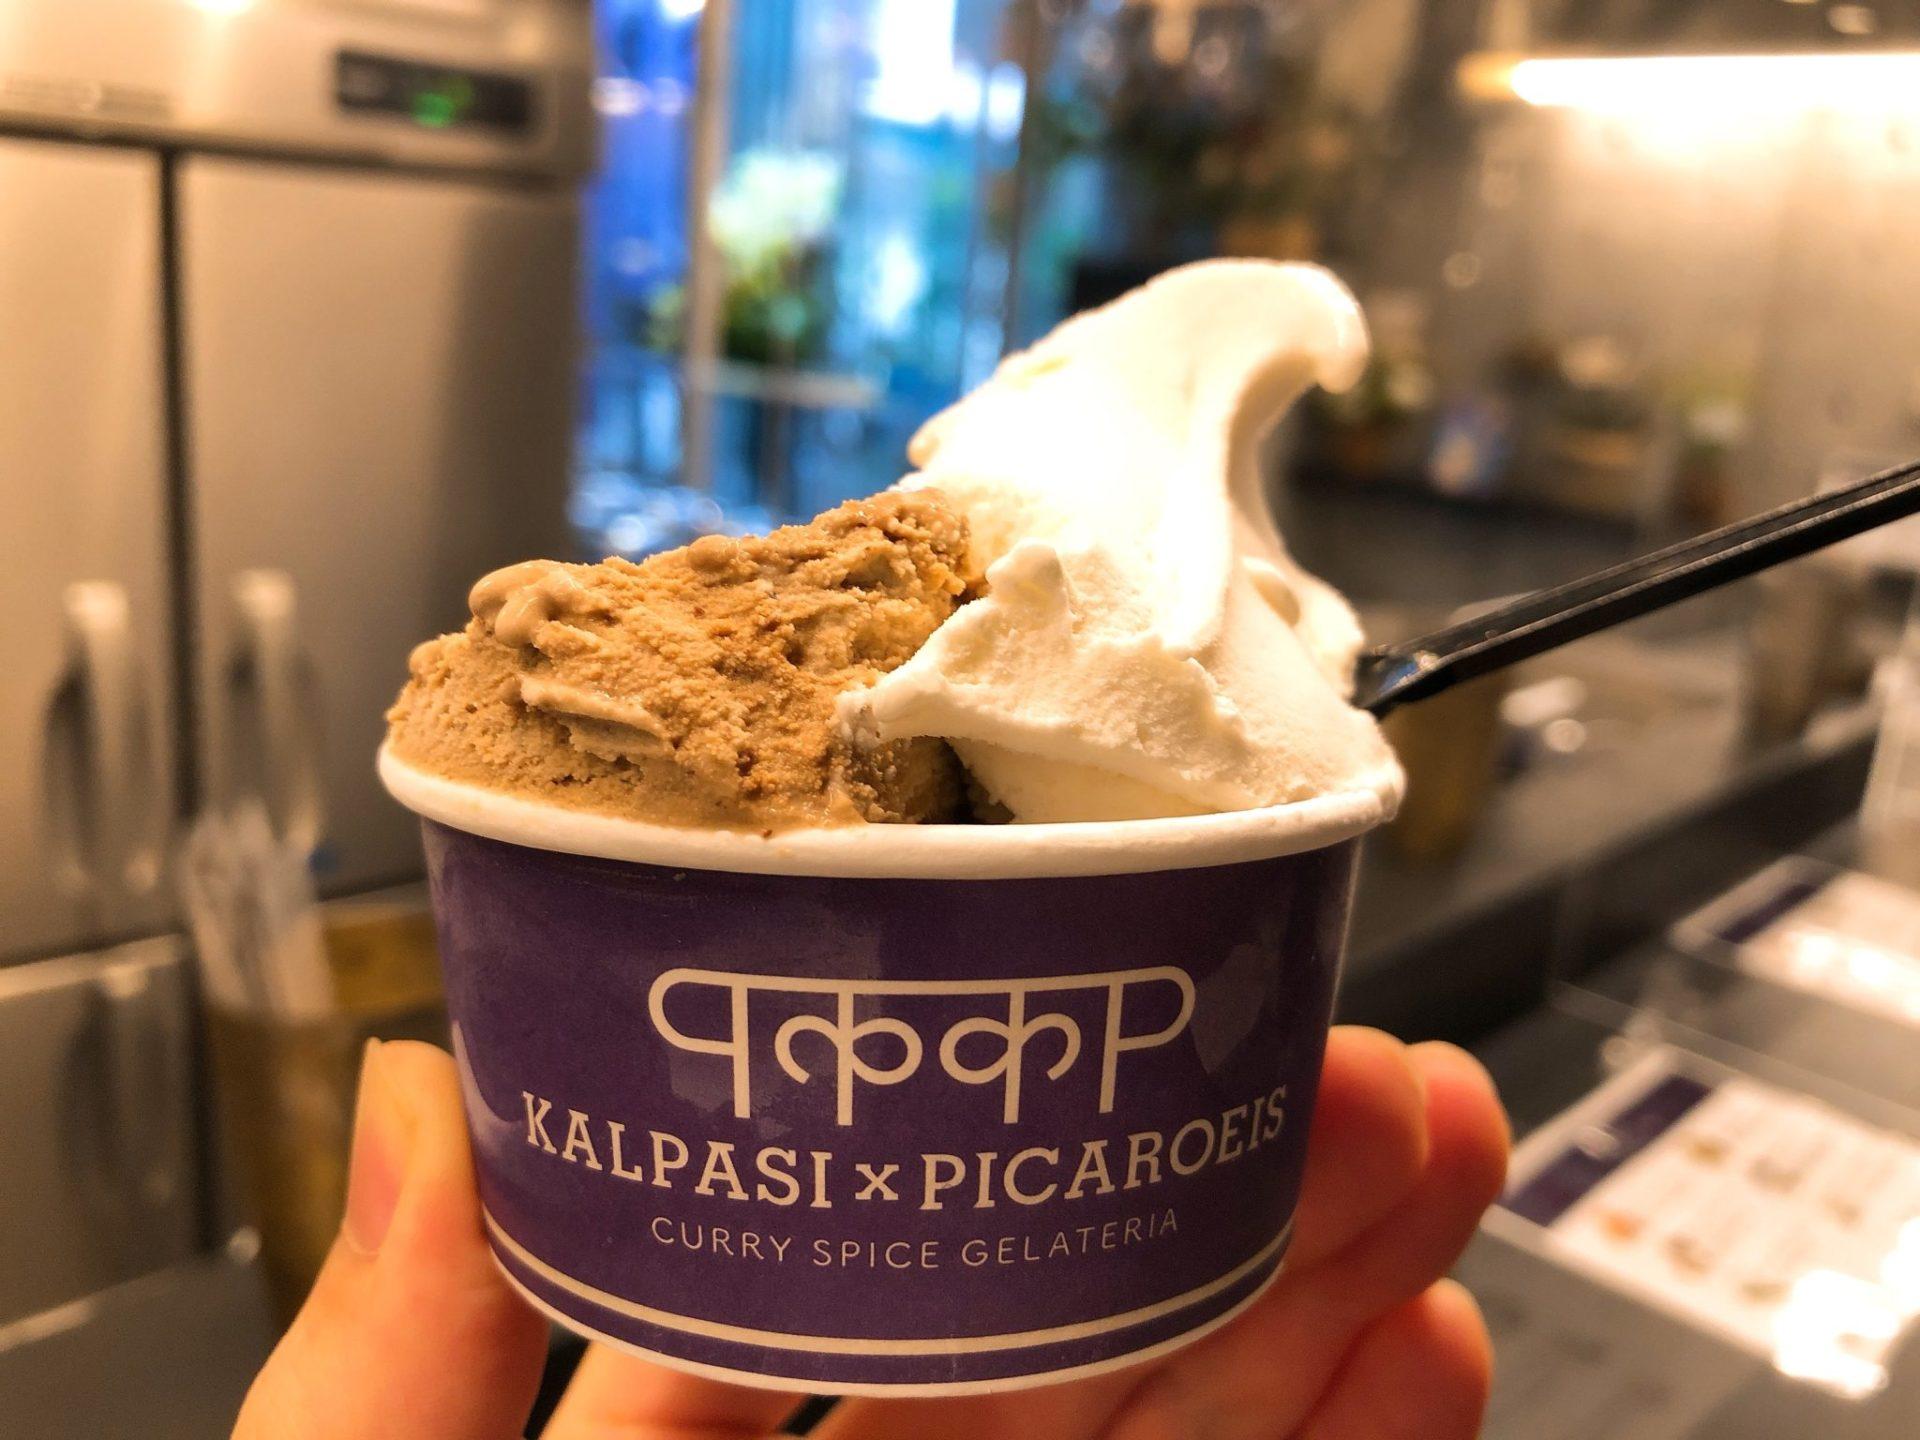 Curry Spice Gelateria KALPASI(カレー スパイス ジェラテリア カルパシ)のジェラート